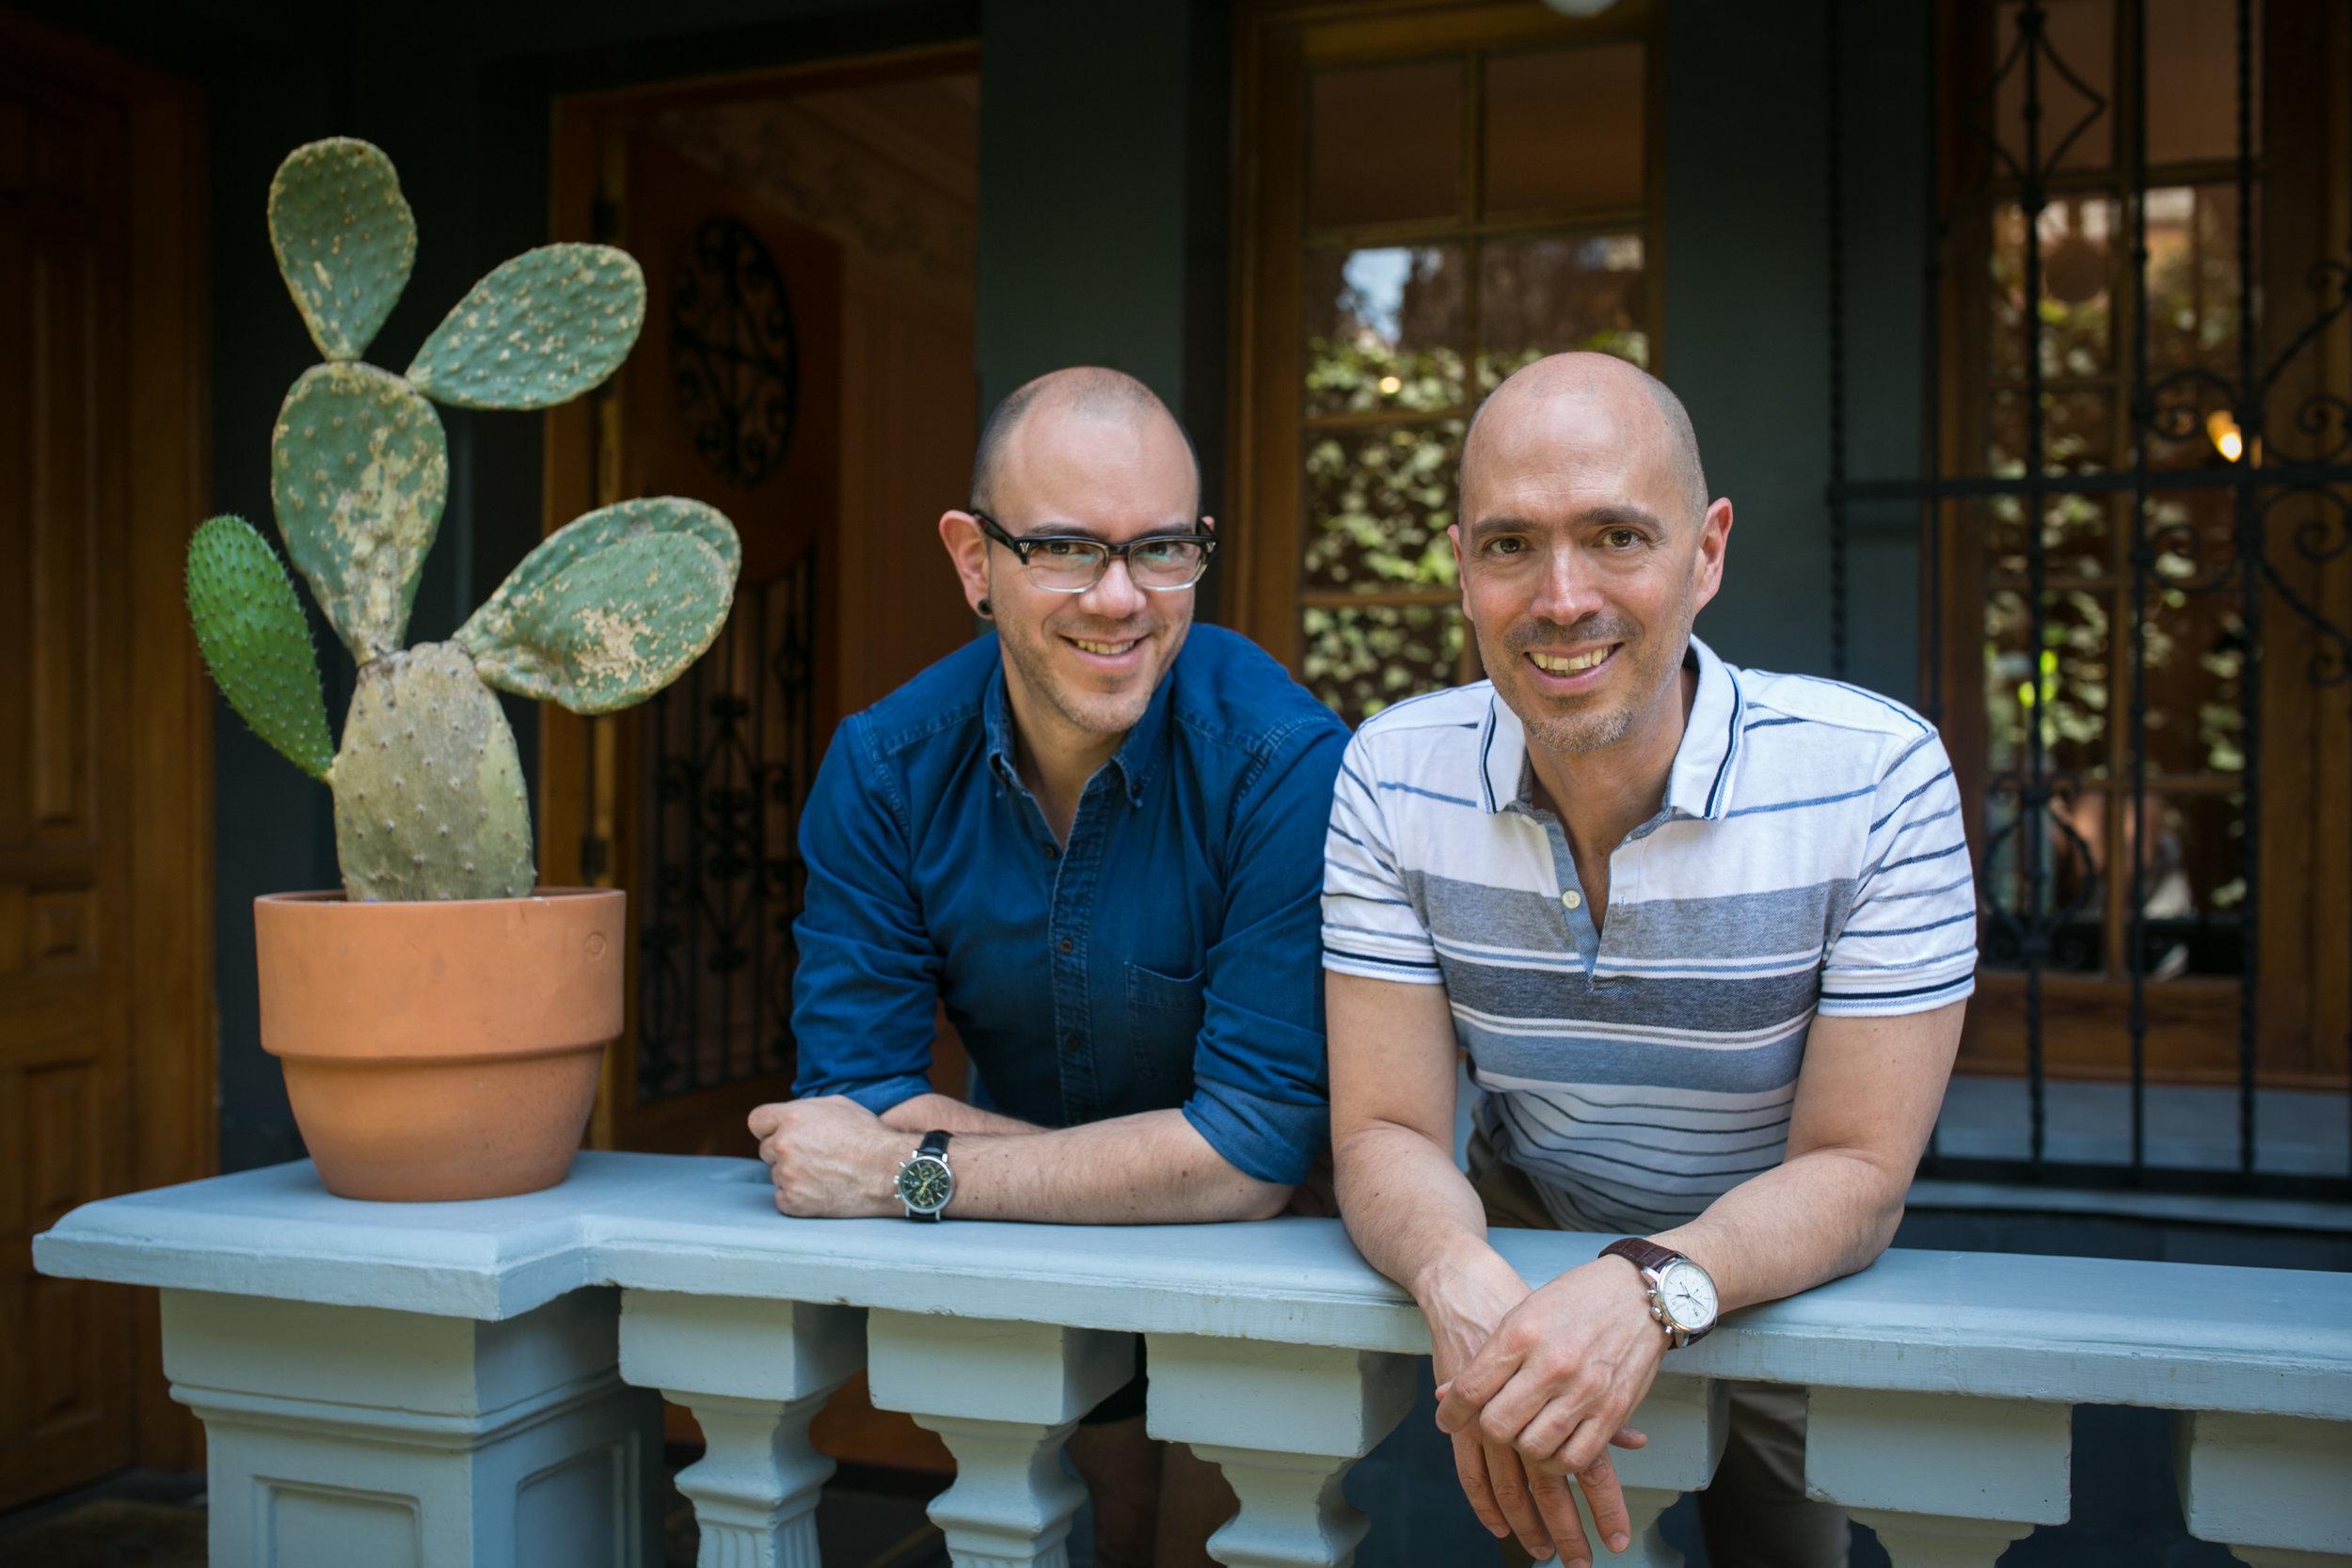 Jorge Fitz and Alberto Estua pose in front of Casa Jacaranda